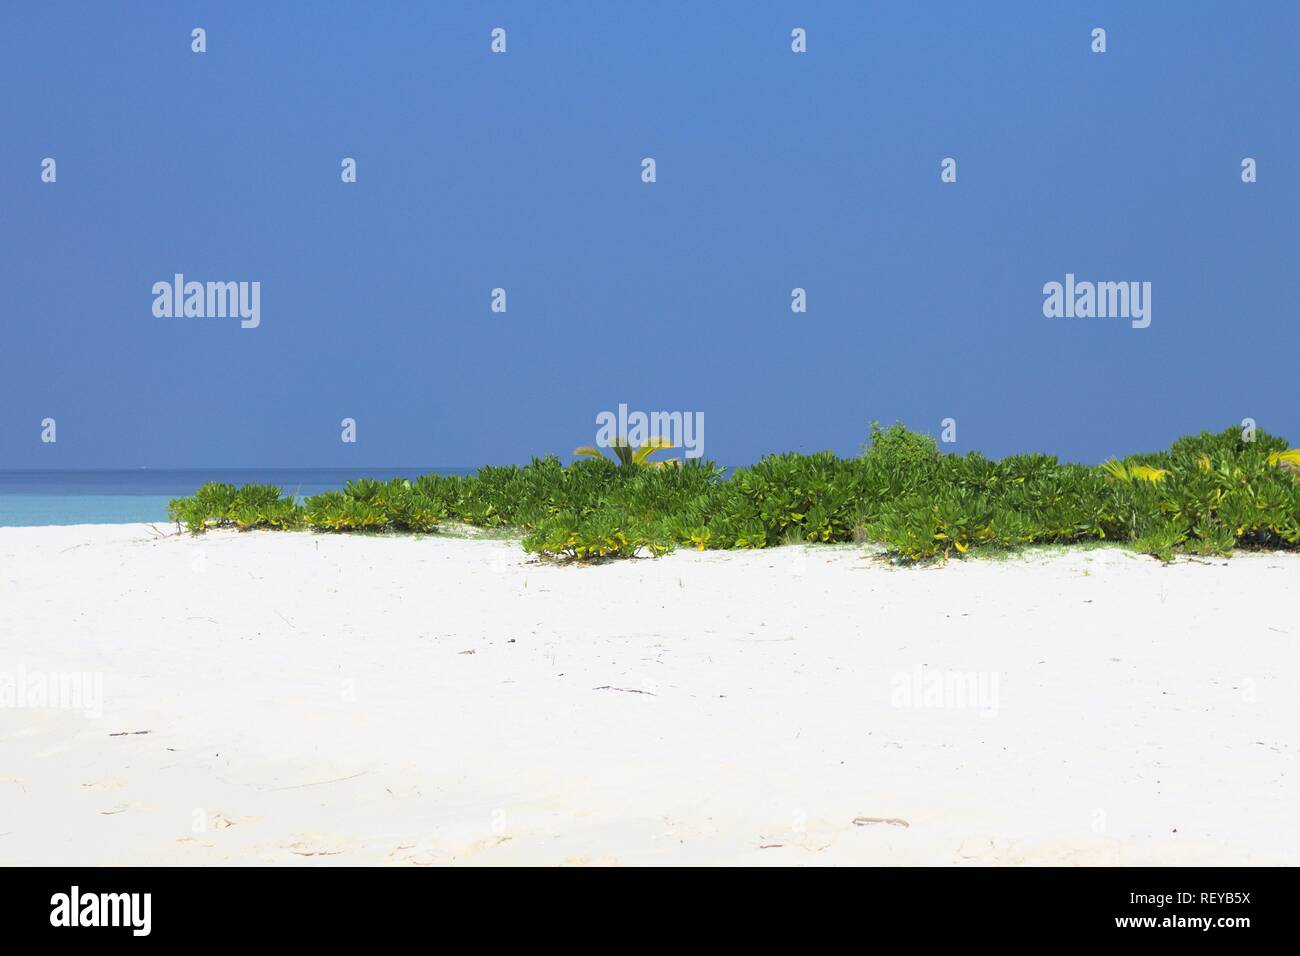 Desert island in Maldives (Ari Atoll) - Stock Image